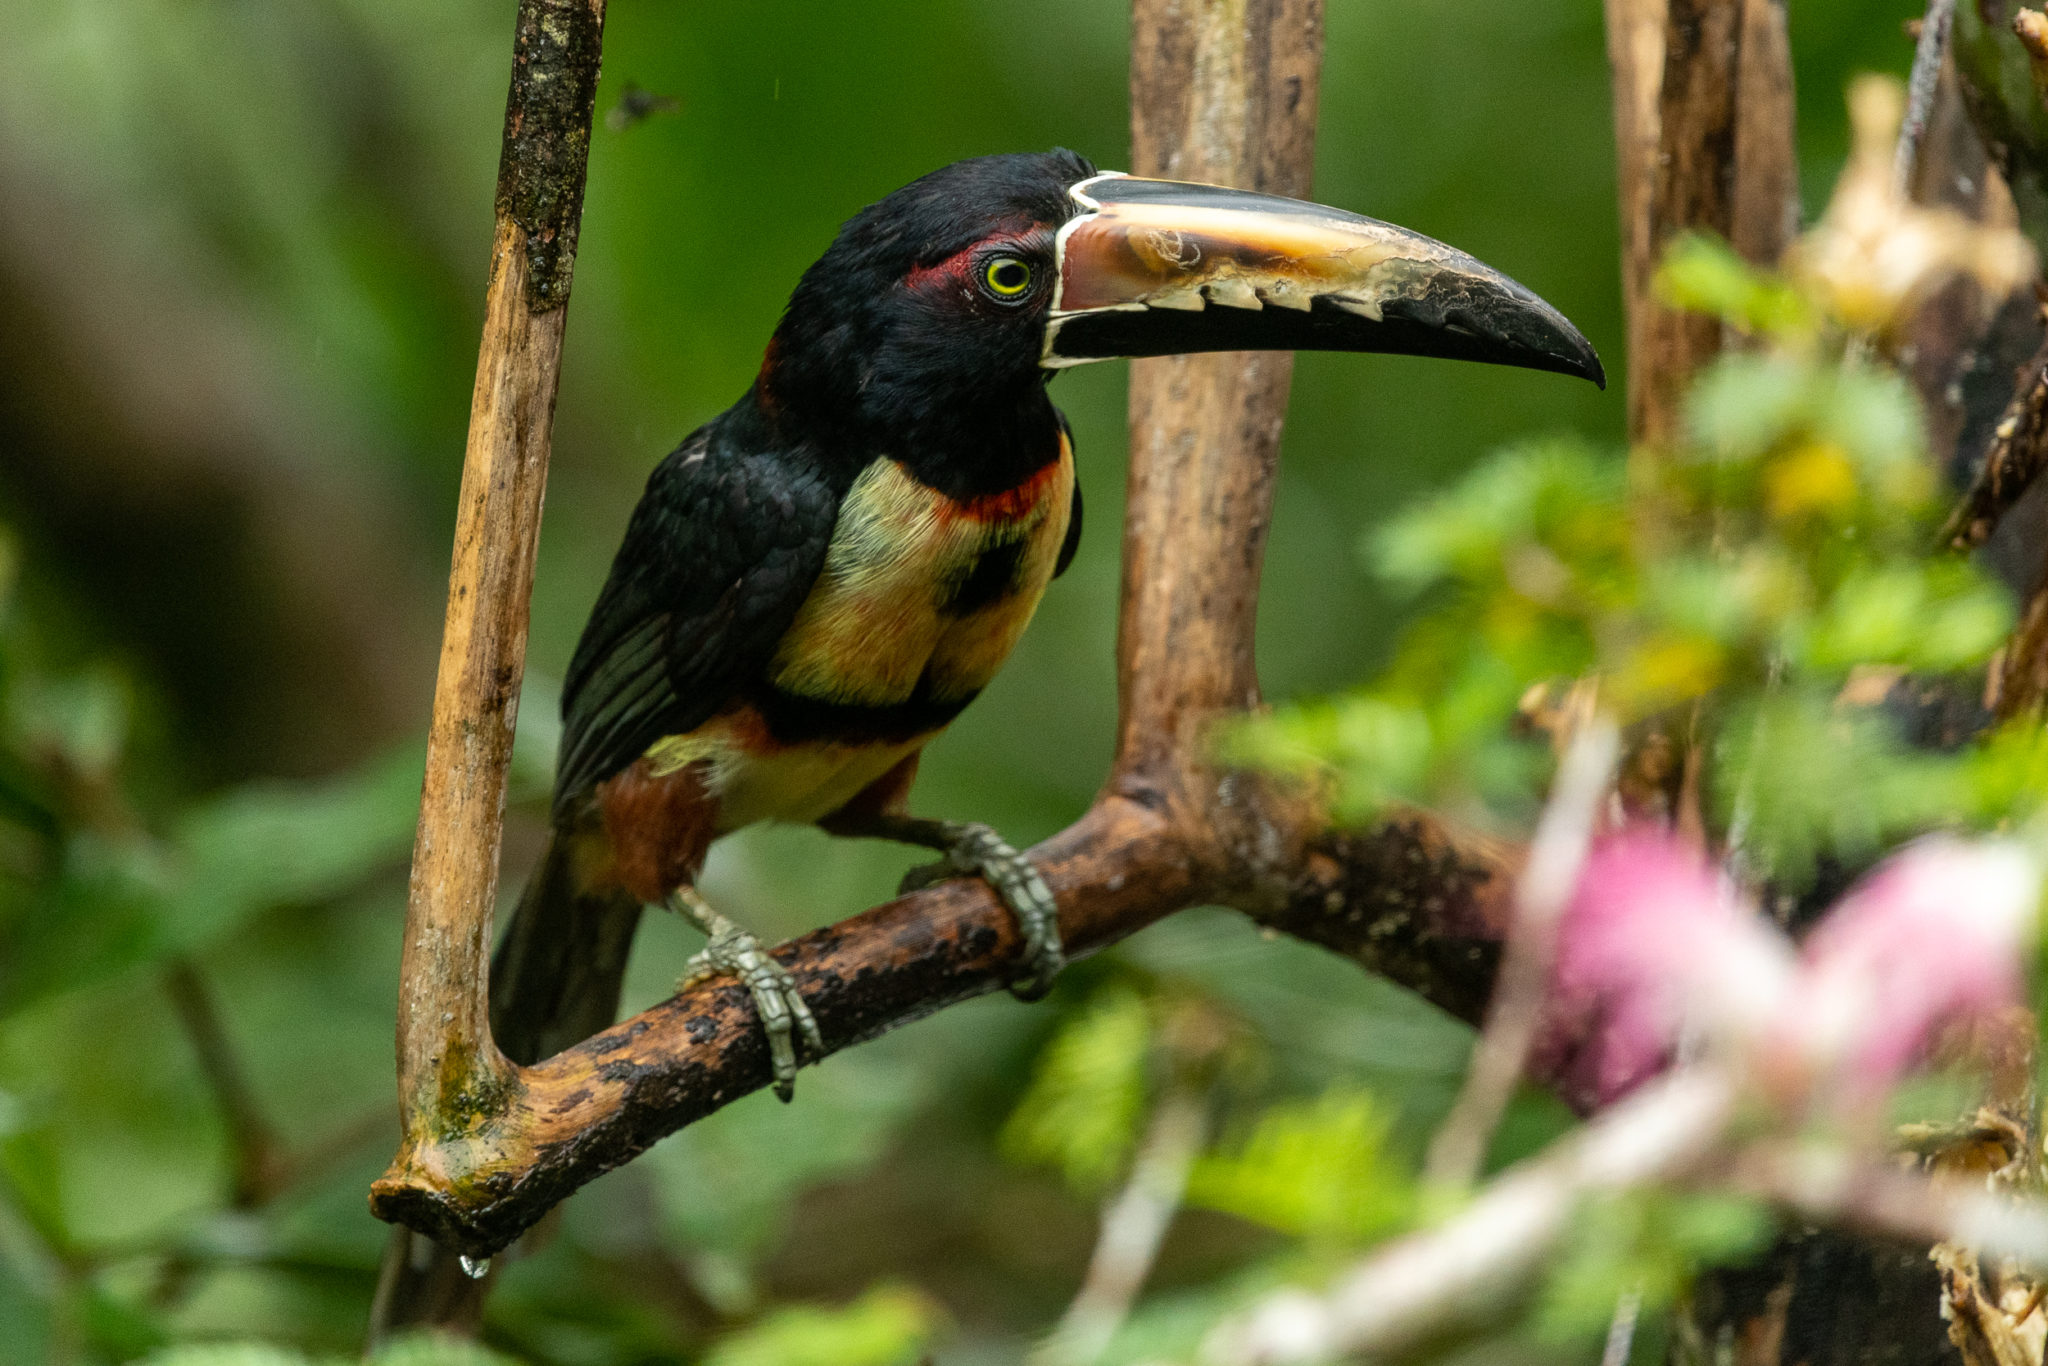 Halsbandarassari (Pteroglossus torquatus)